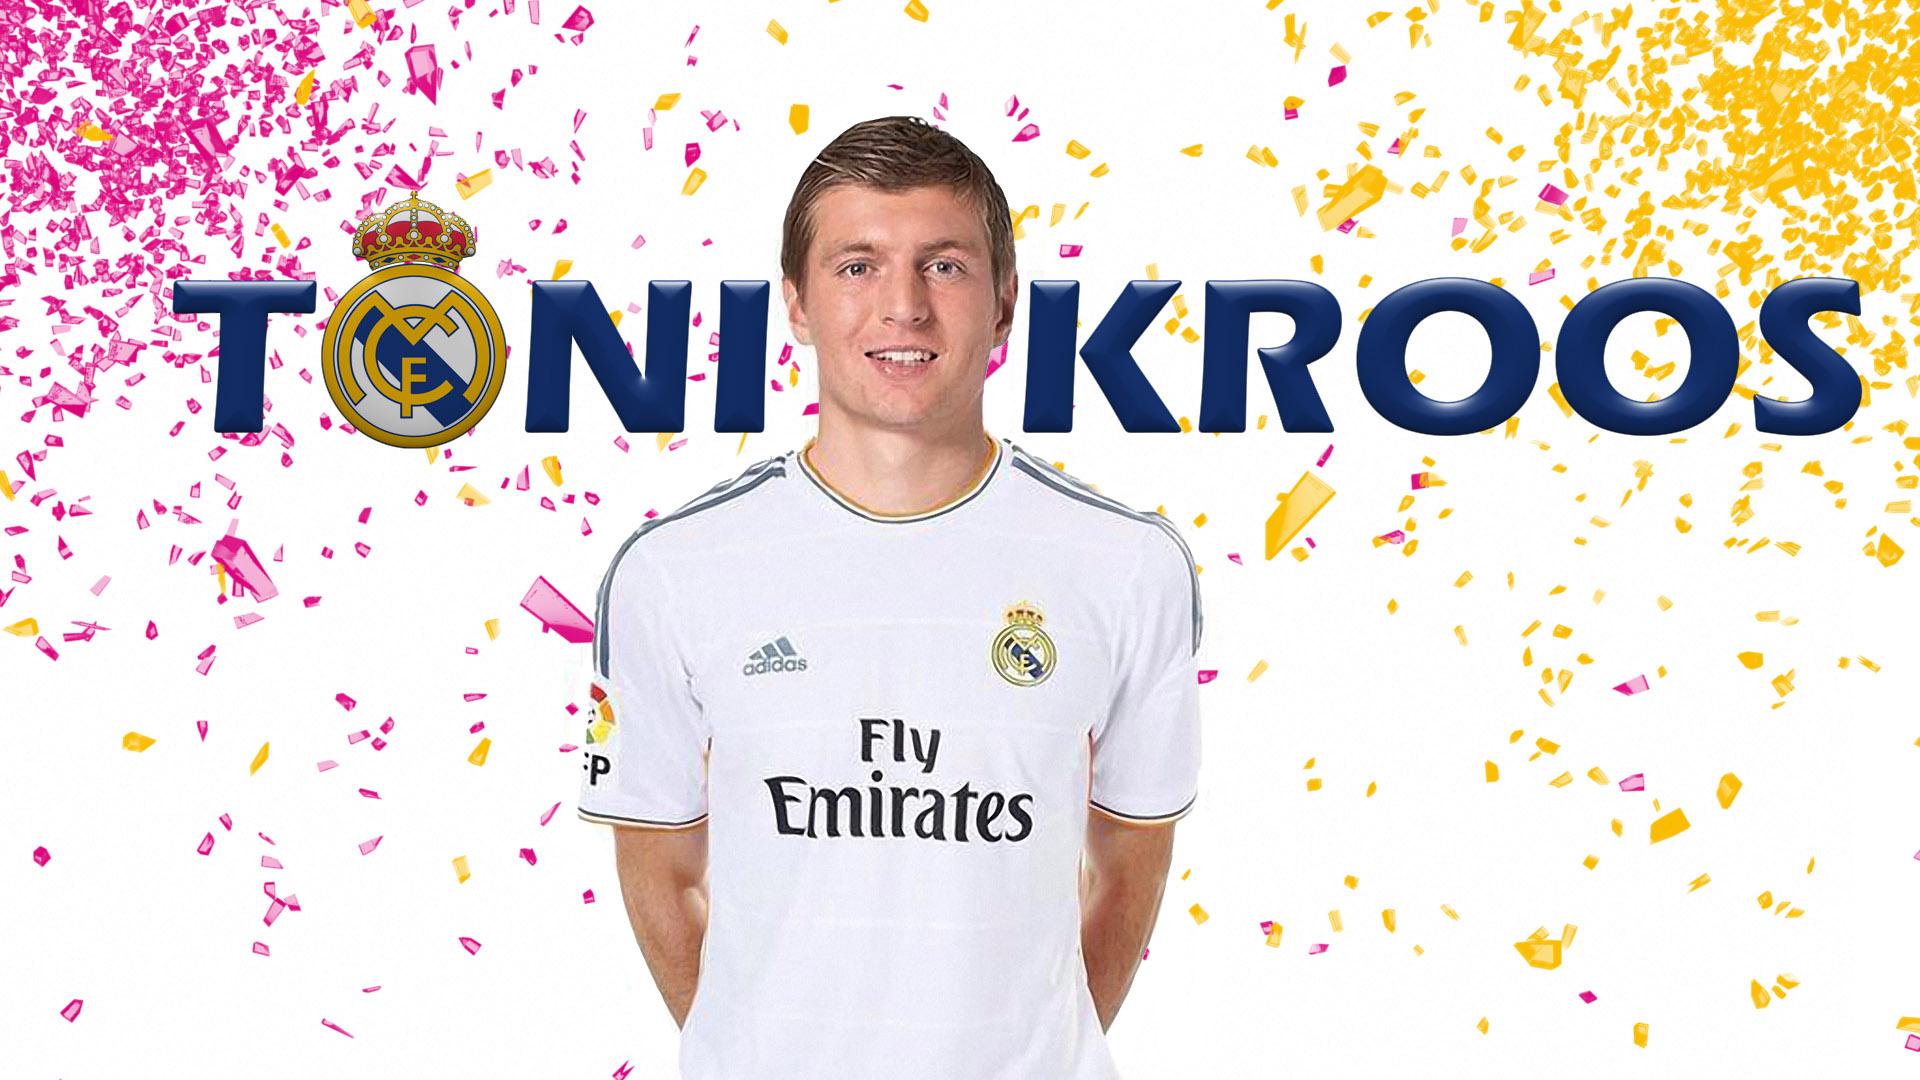 Toni-Kroos-Real-Madrid-CF-2014-Wallpaper